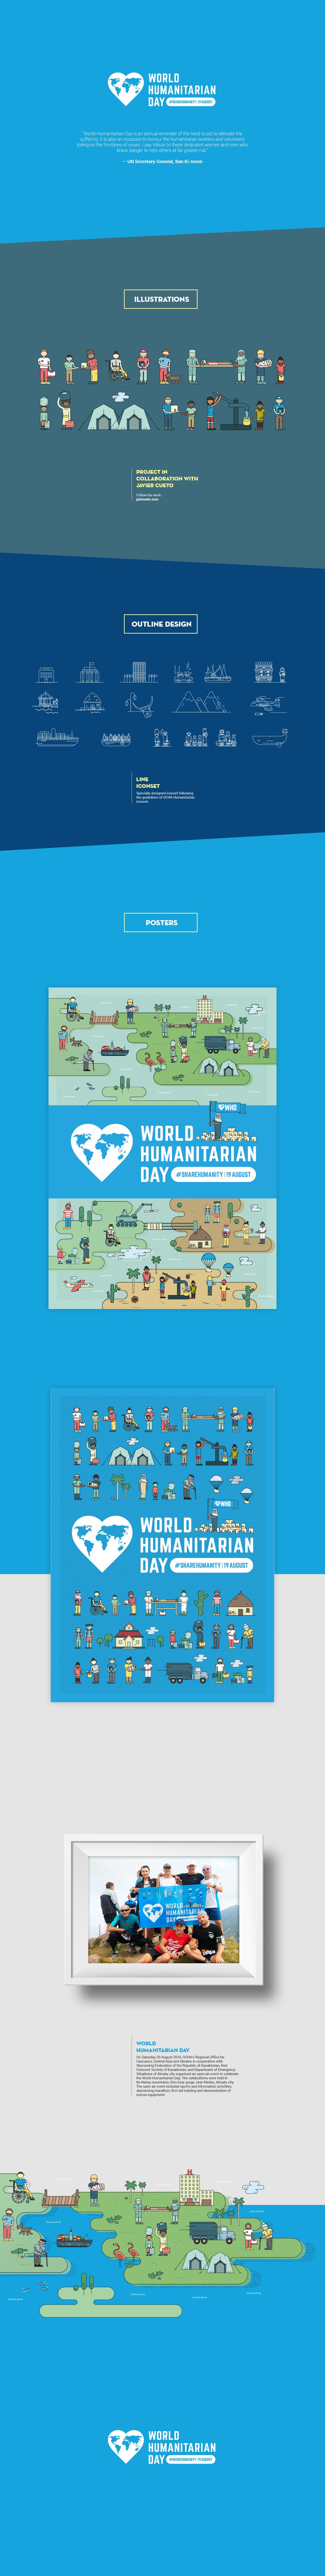 whd WORLD HUMANITARIAN DAY United Nations ocha Nations Unies onu un